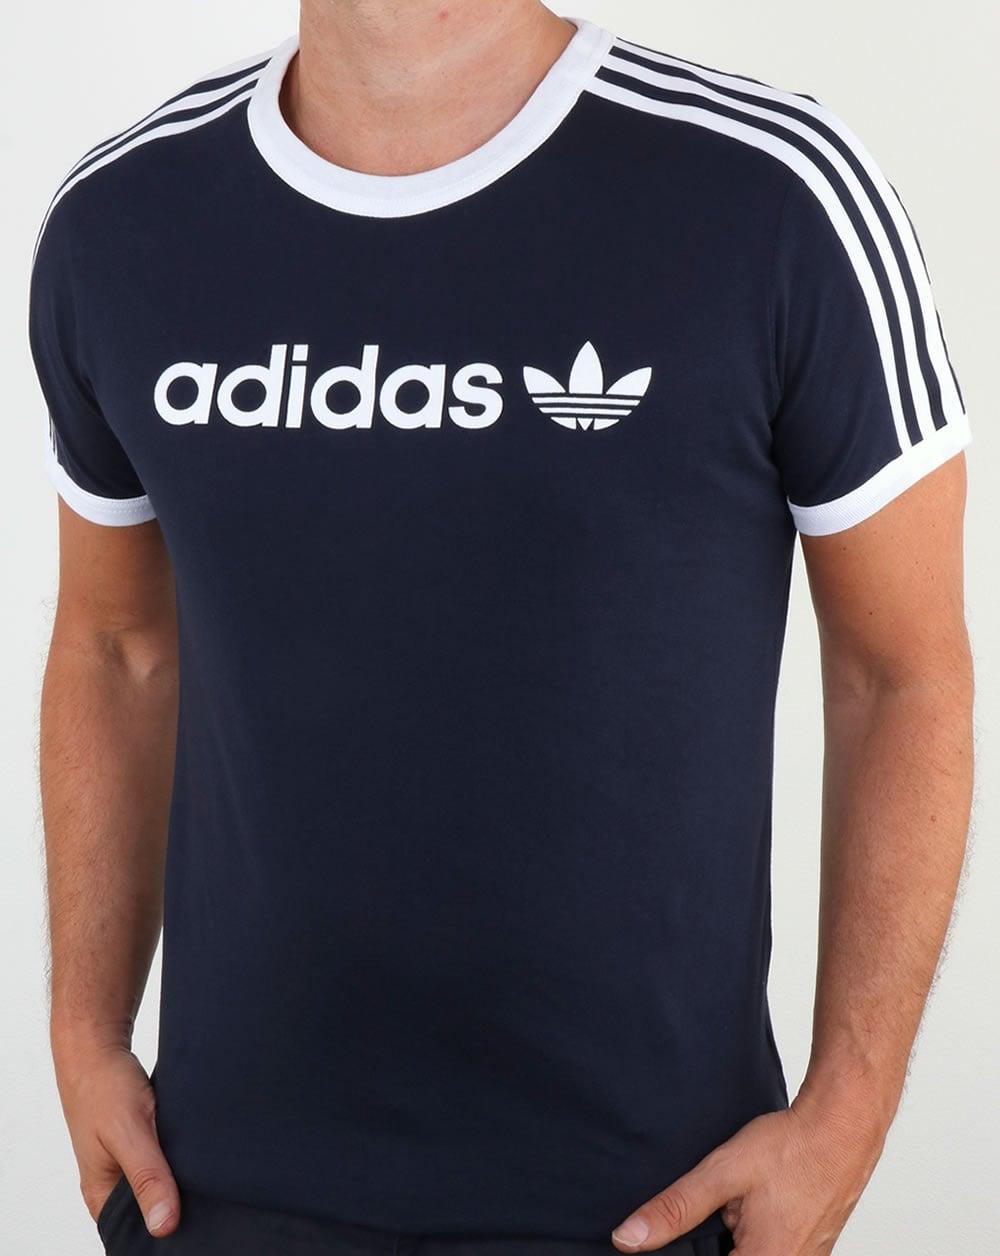 cde5ff364 Adidas Originals Linear T Shirt Legend Ink,ringer,3 stripes,tee,mens